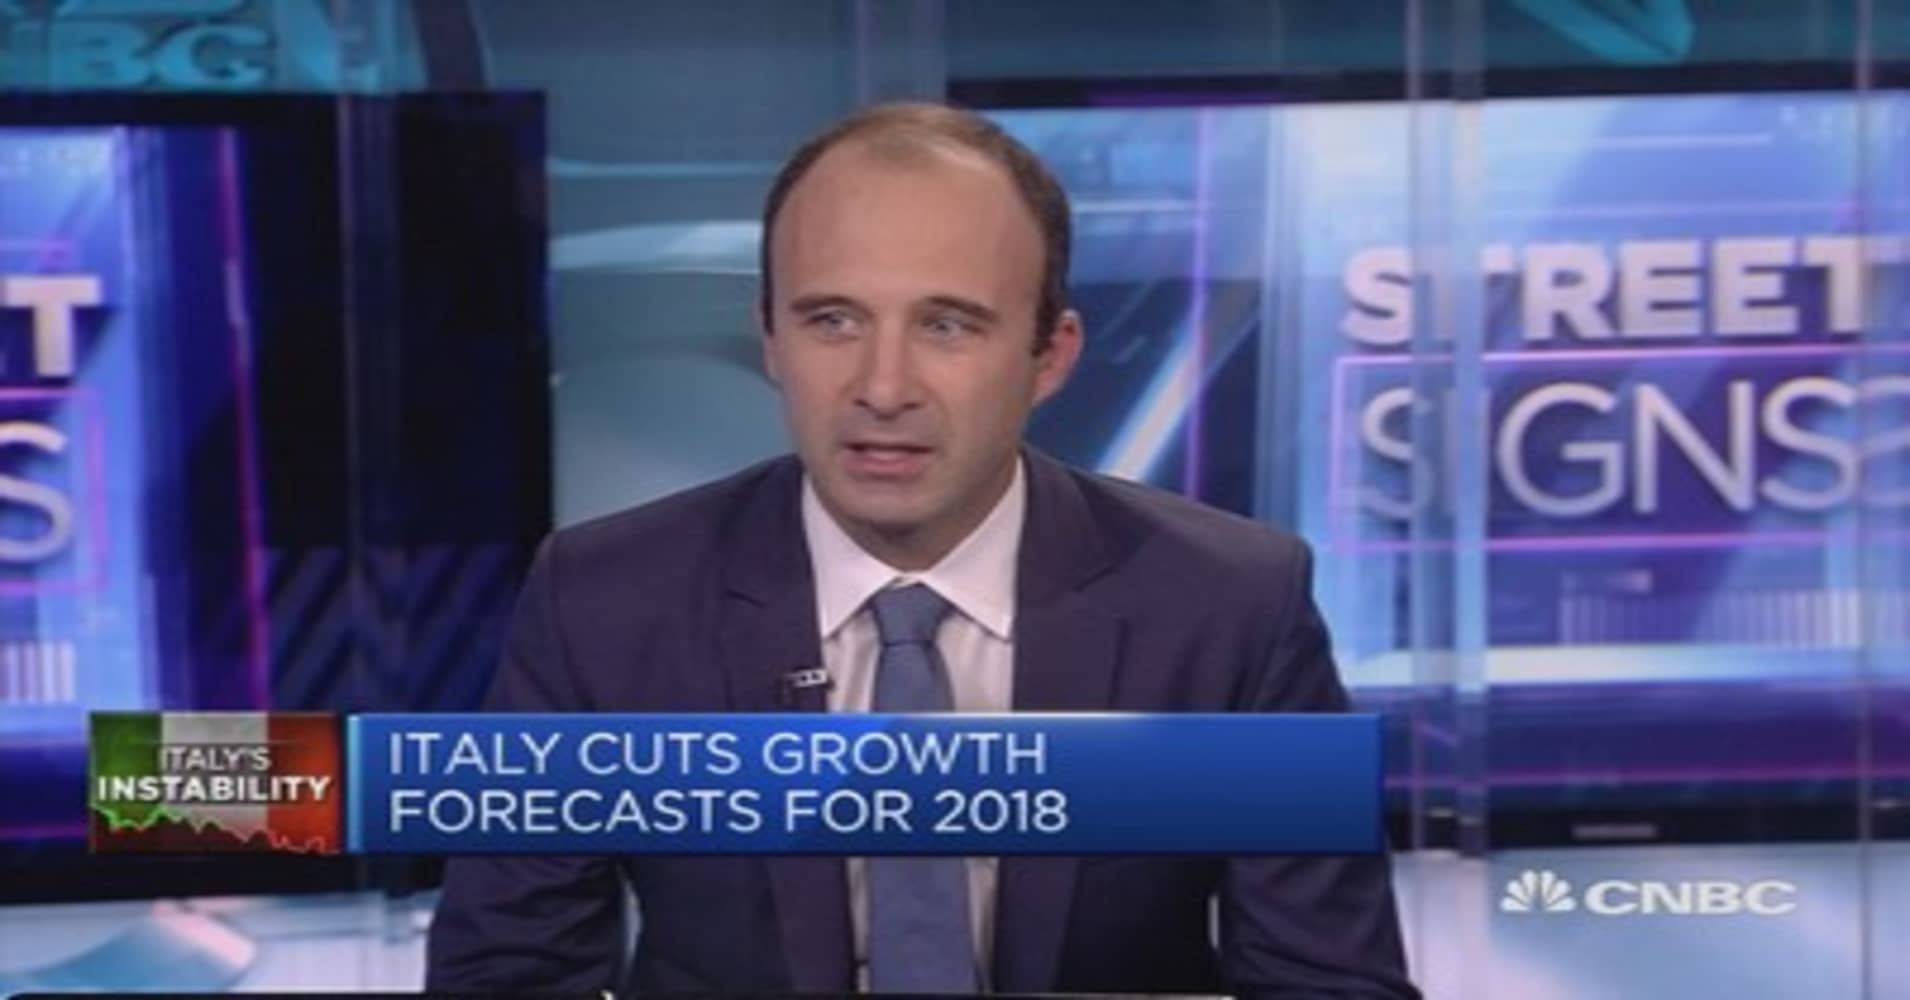 Analyst: Little contagion from Italian market stress